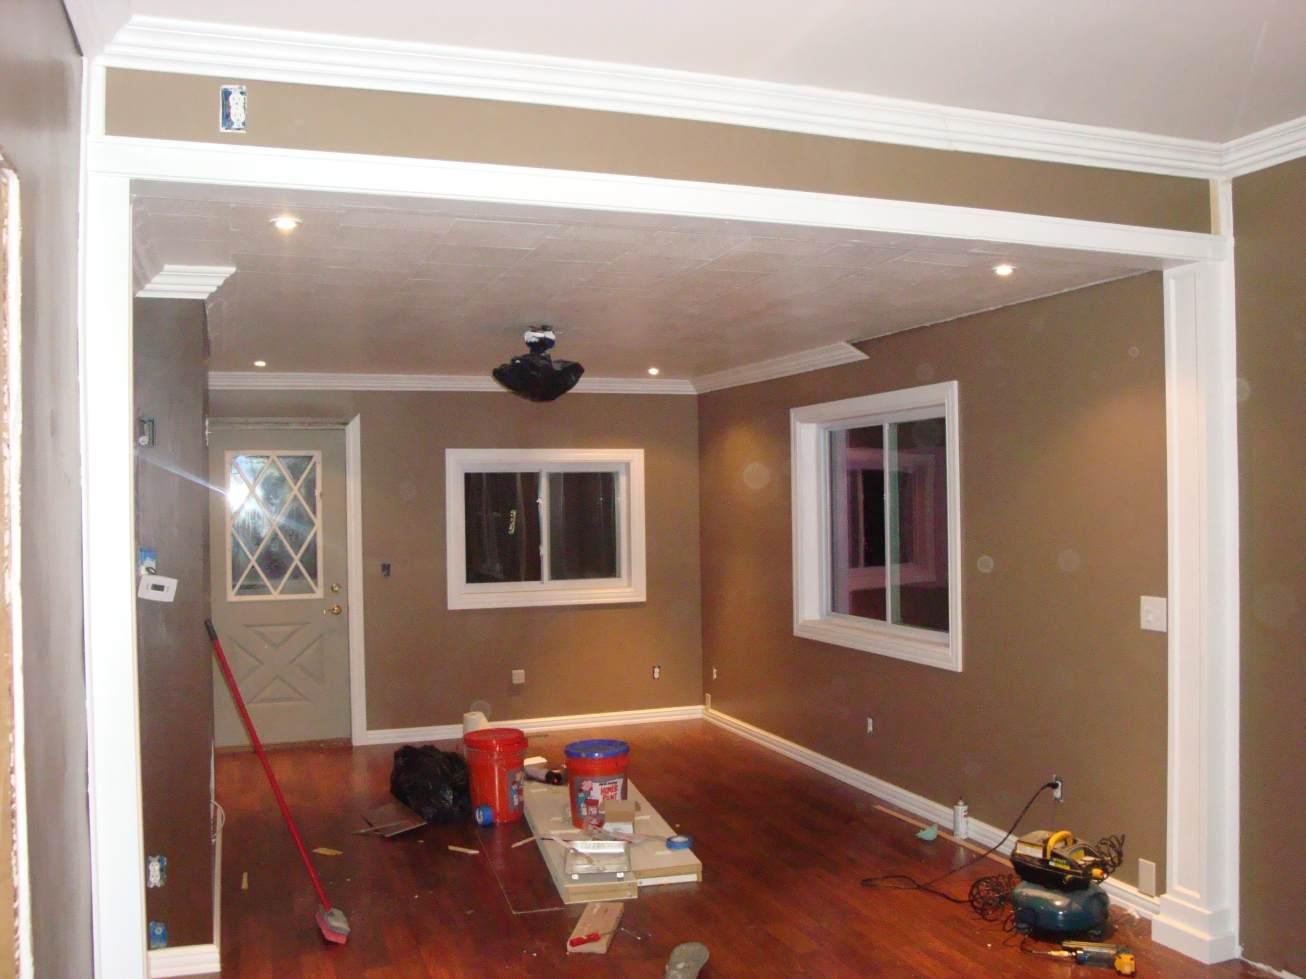 First house remodel-dsc08398.jpg